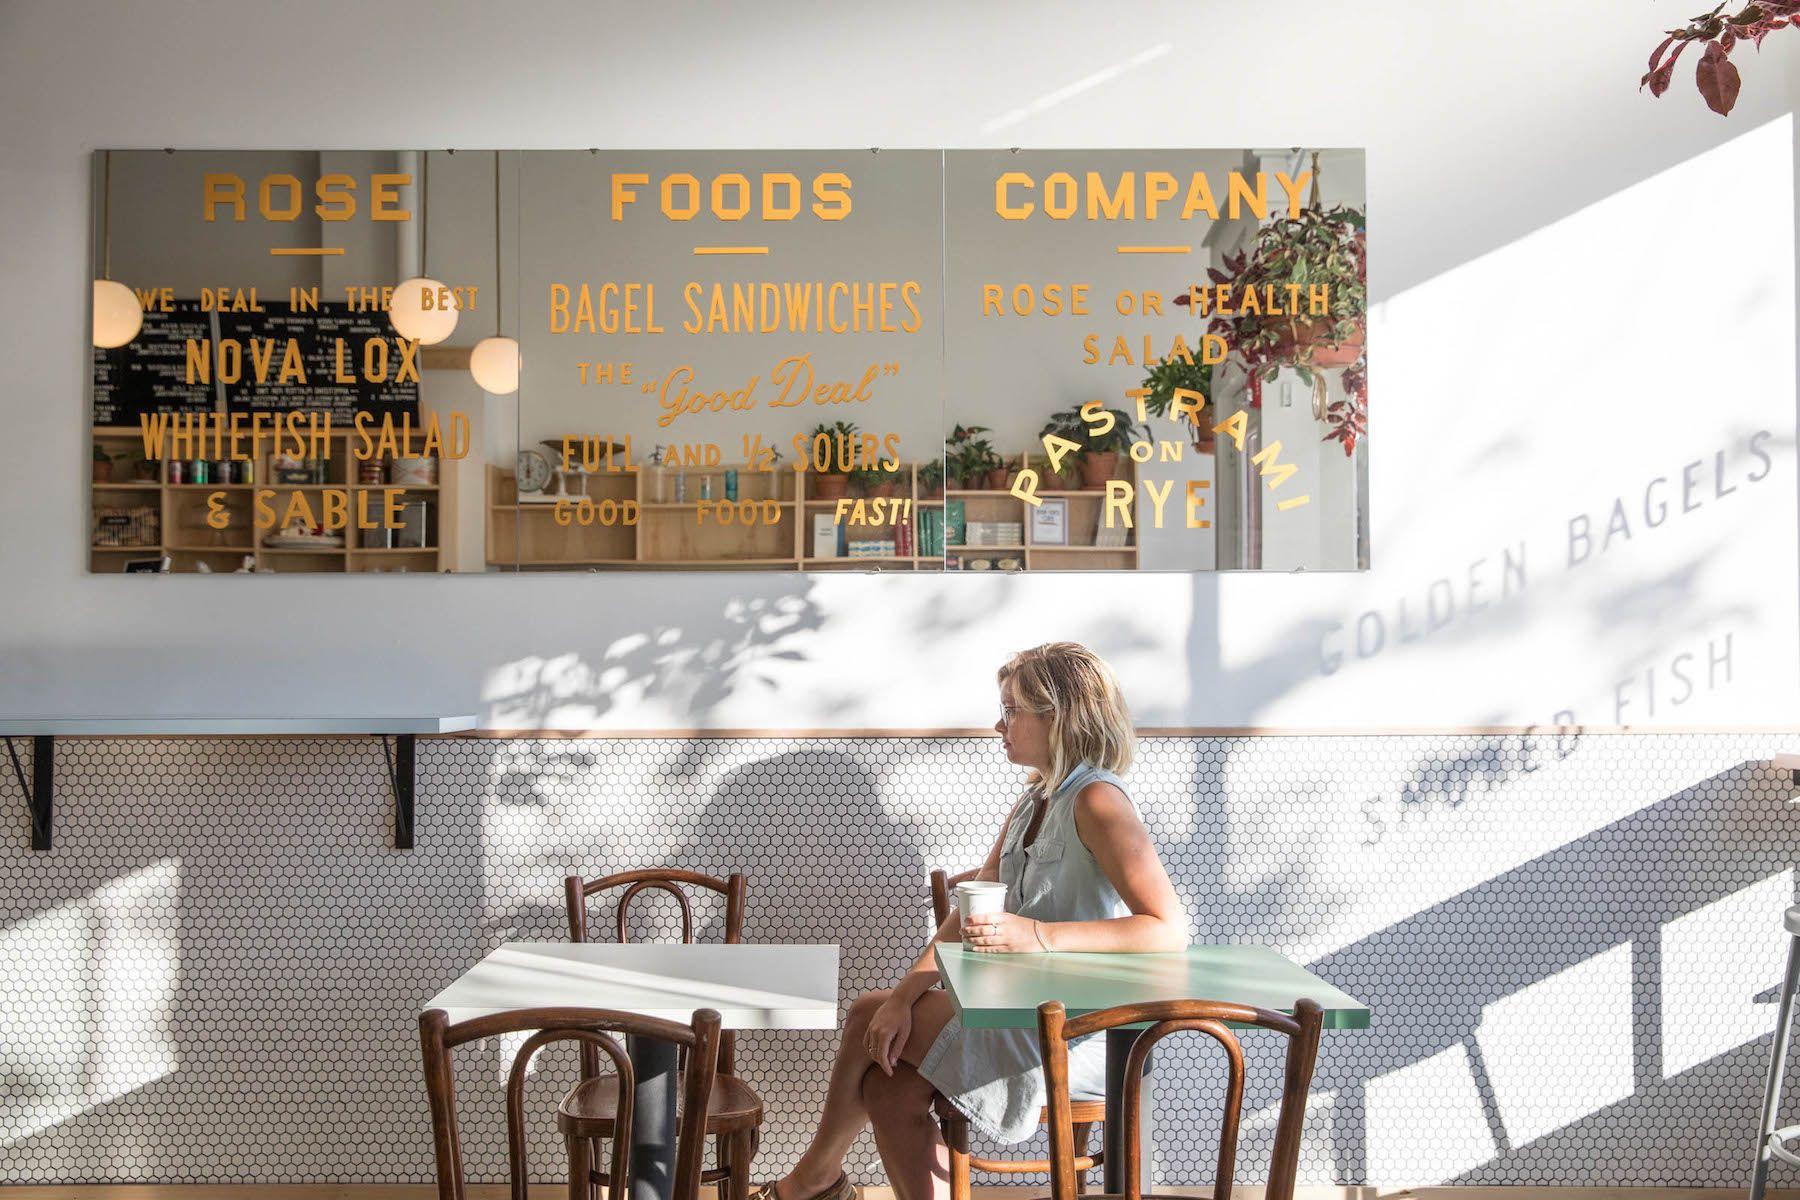 Pin By Concreetadvies On Specialty Coffee Coffee Machine Design Coffee Shop Menu Coffee Machine